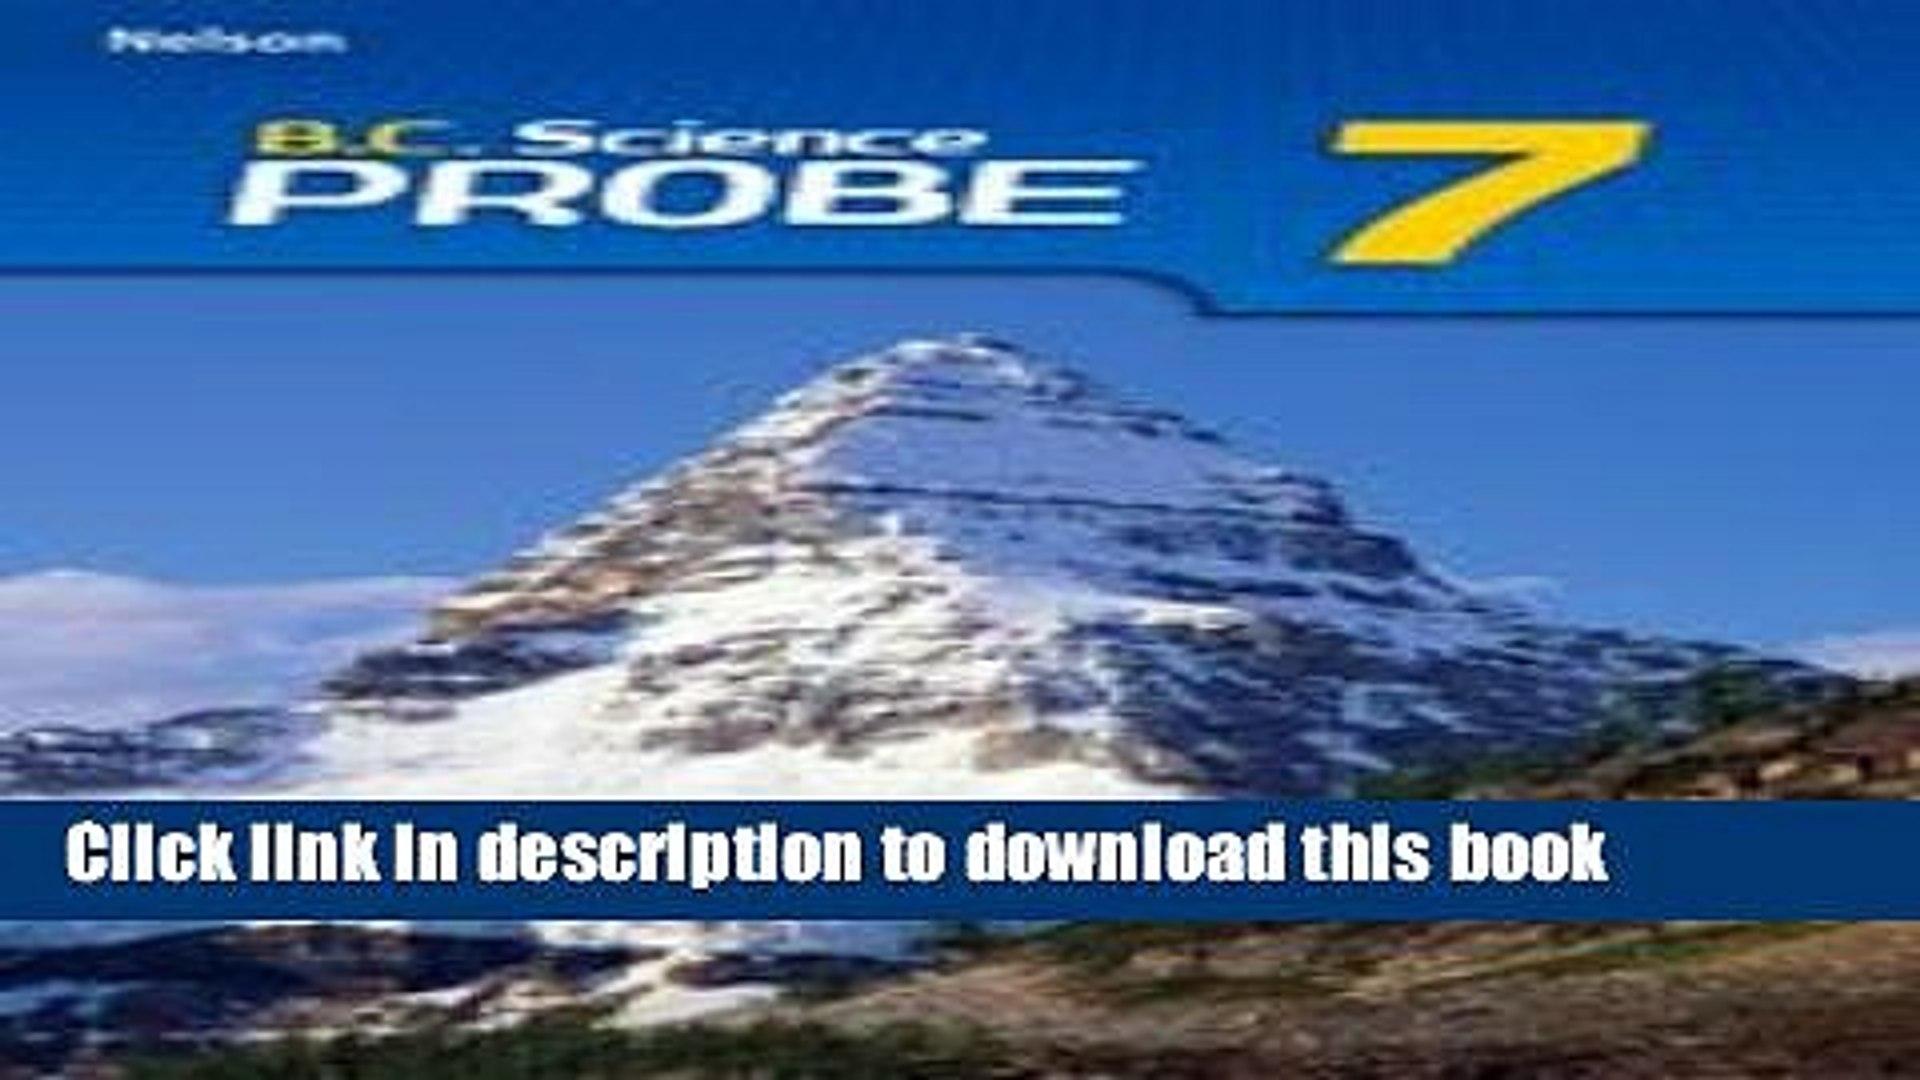 Books B.C. (British Columbia) Science Probe 7 Free Online